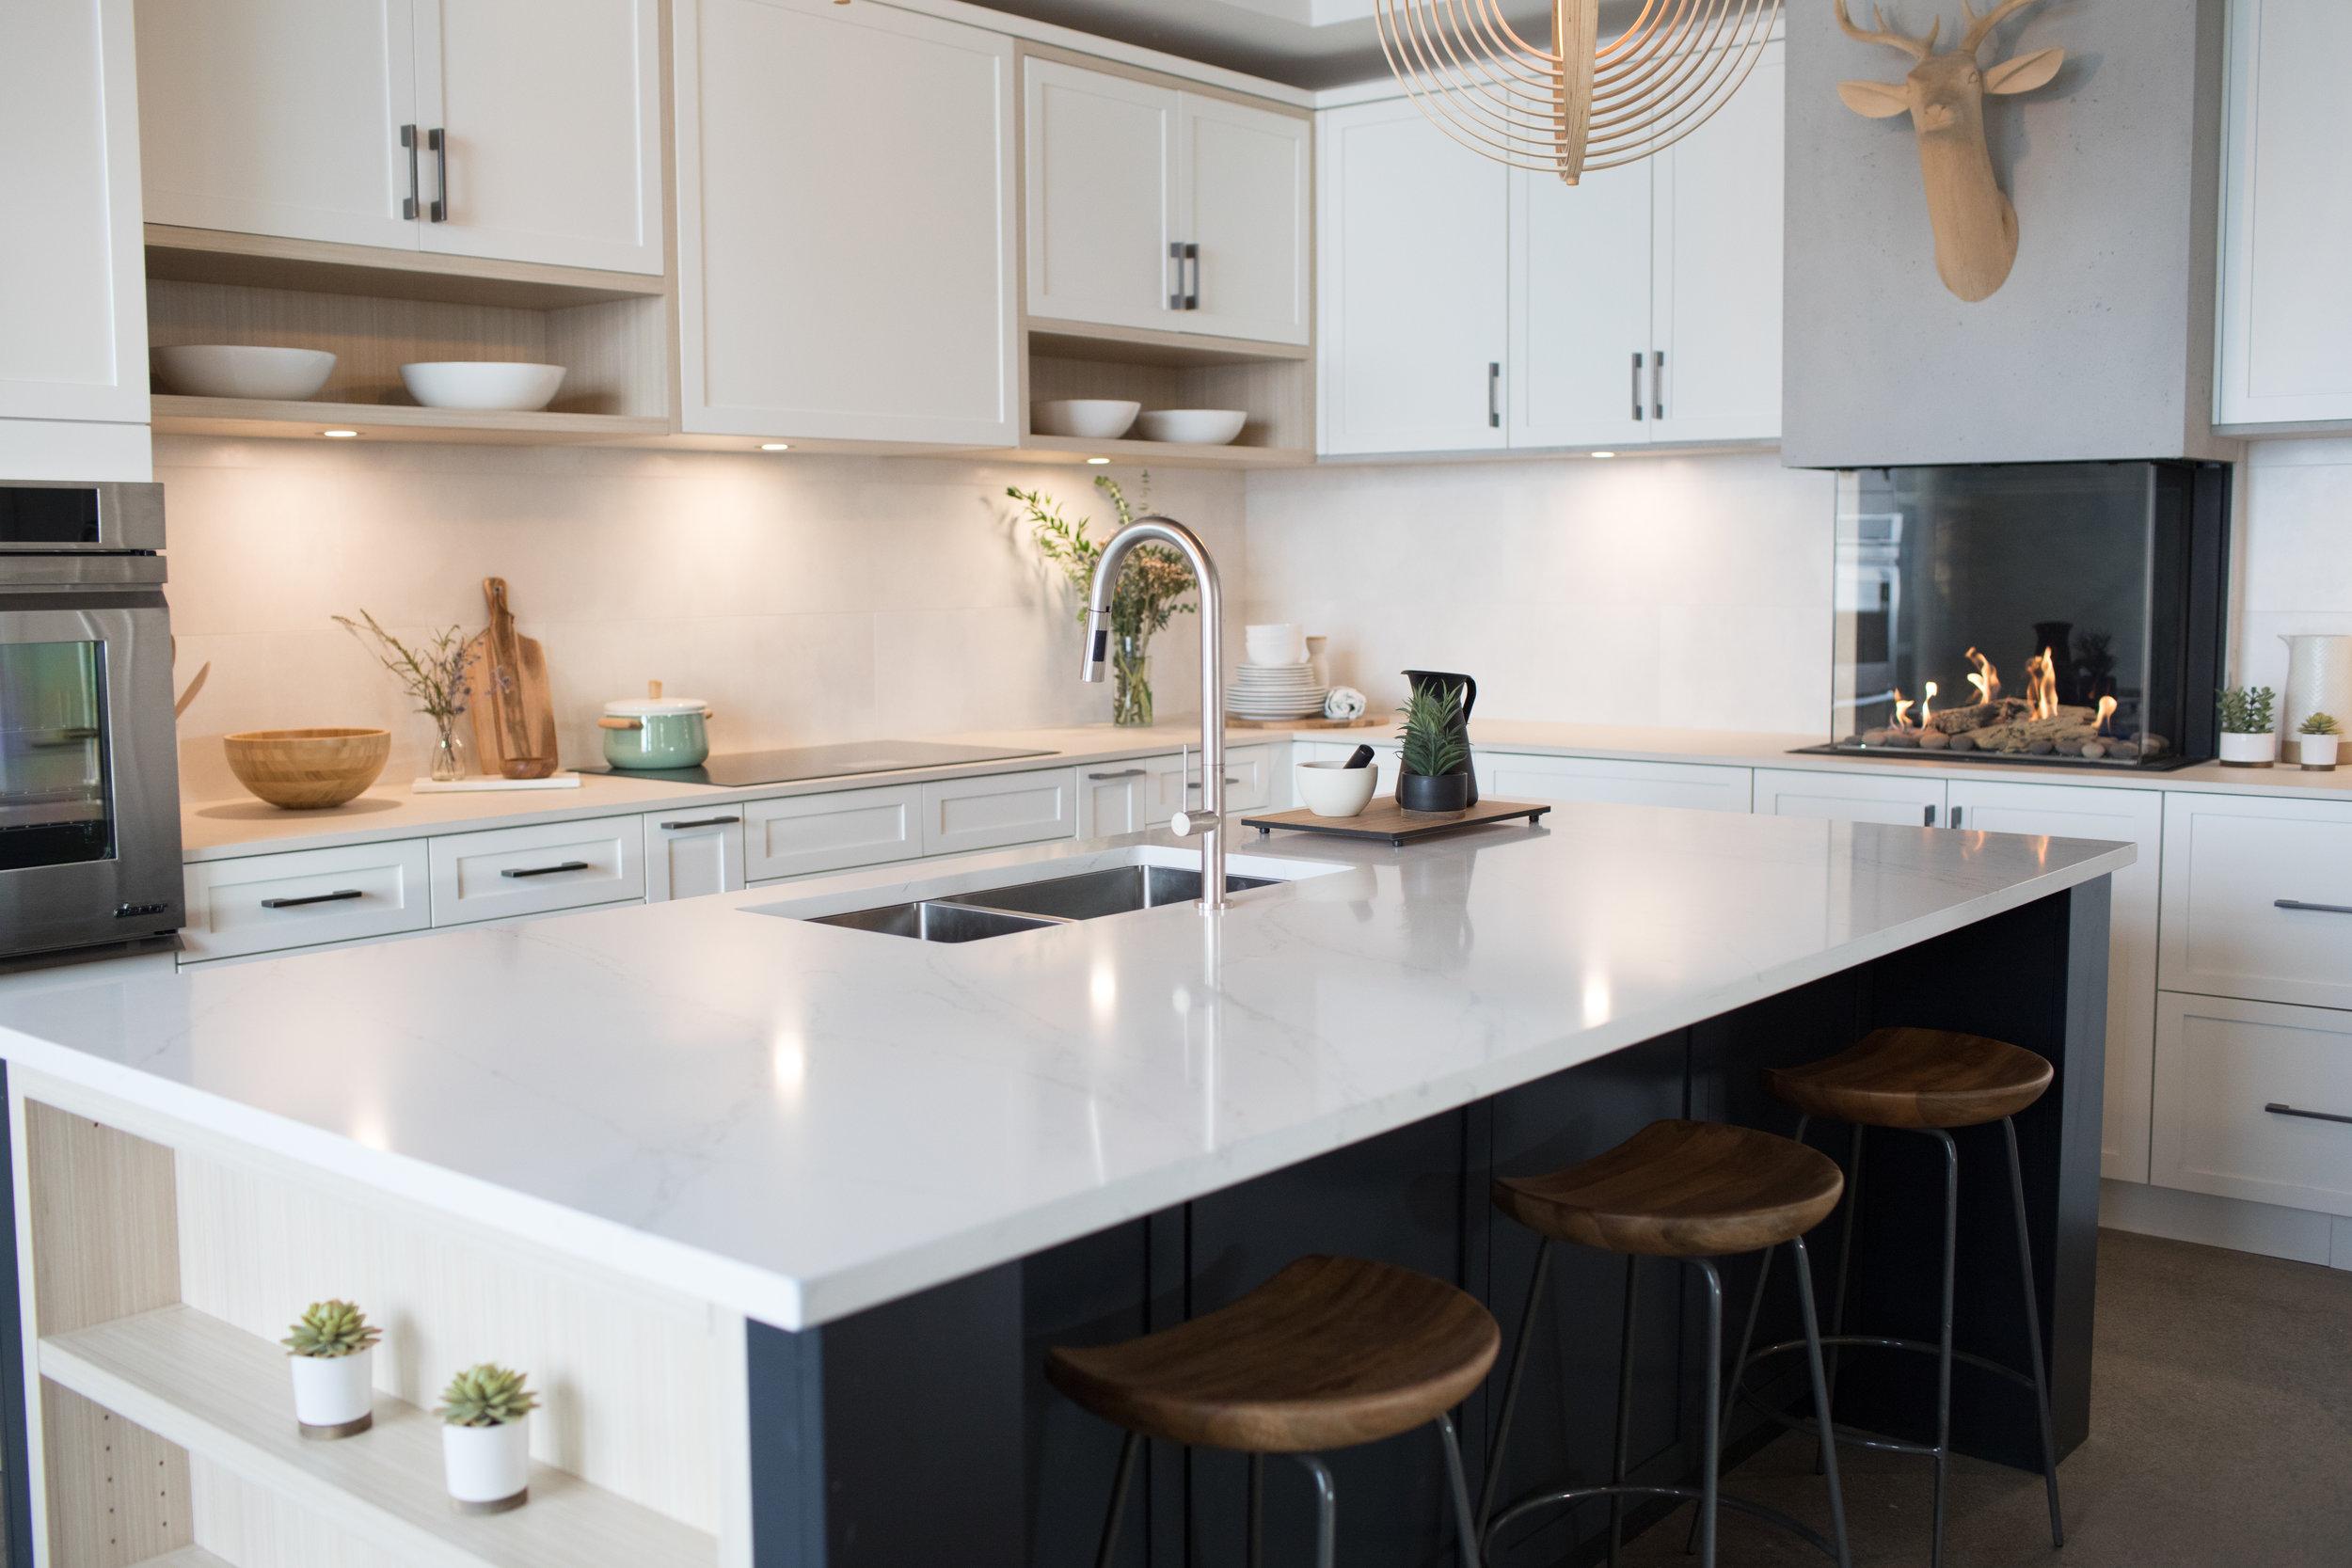 showroom-kitchen-fireplace.jpg